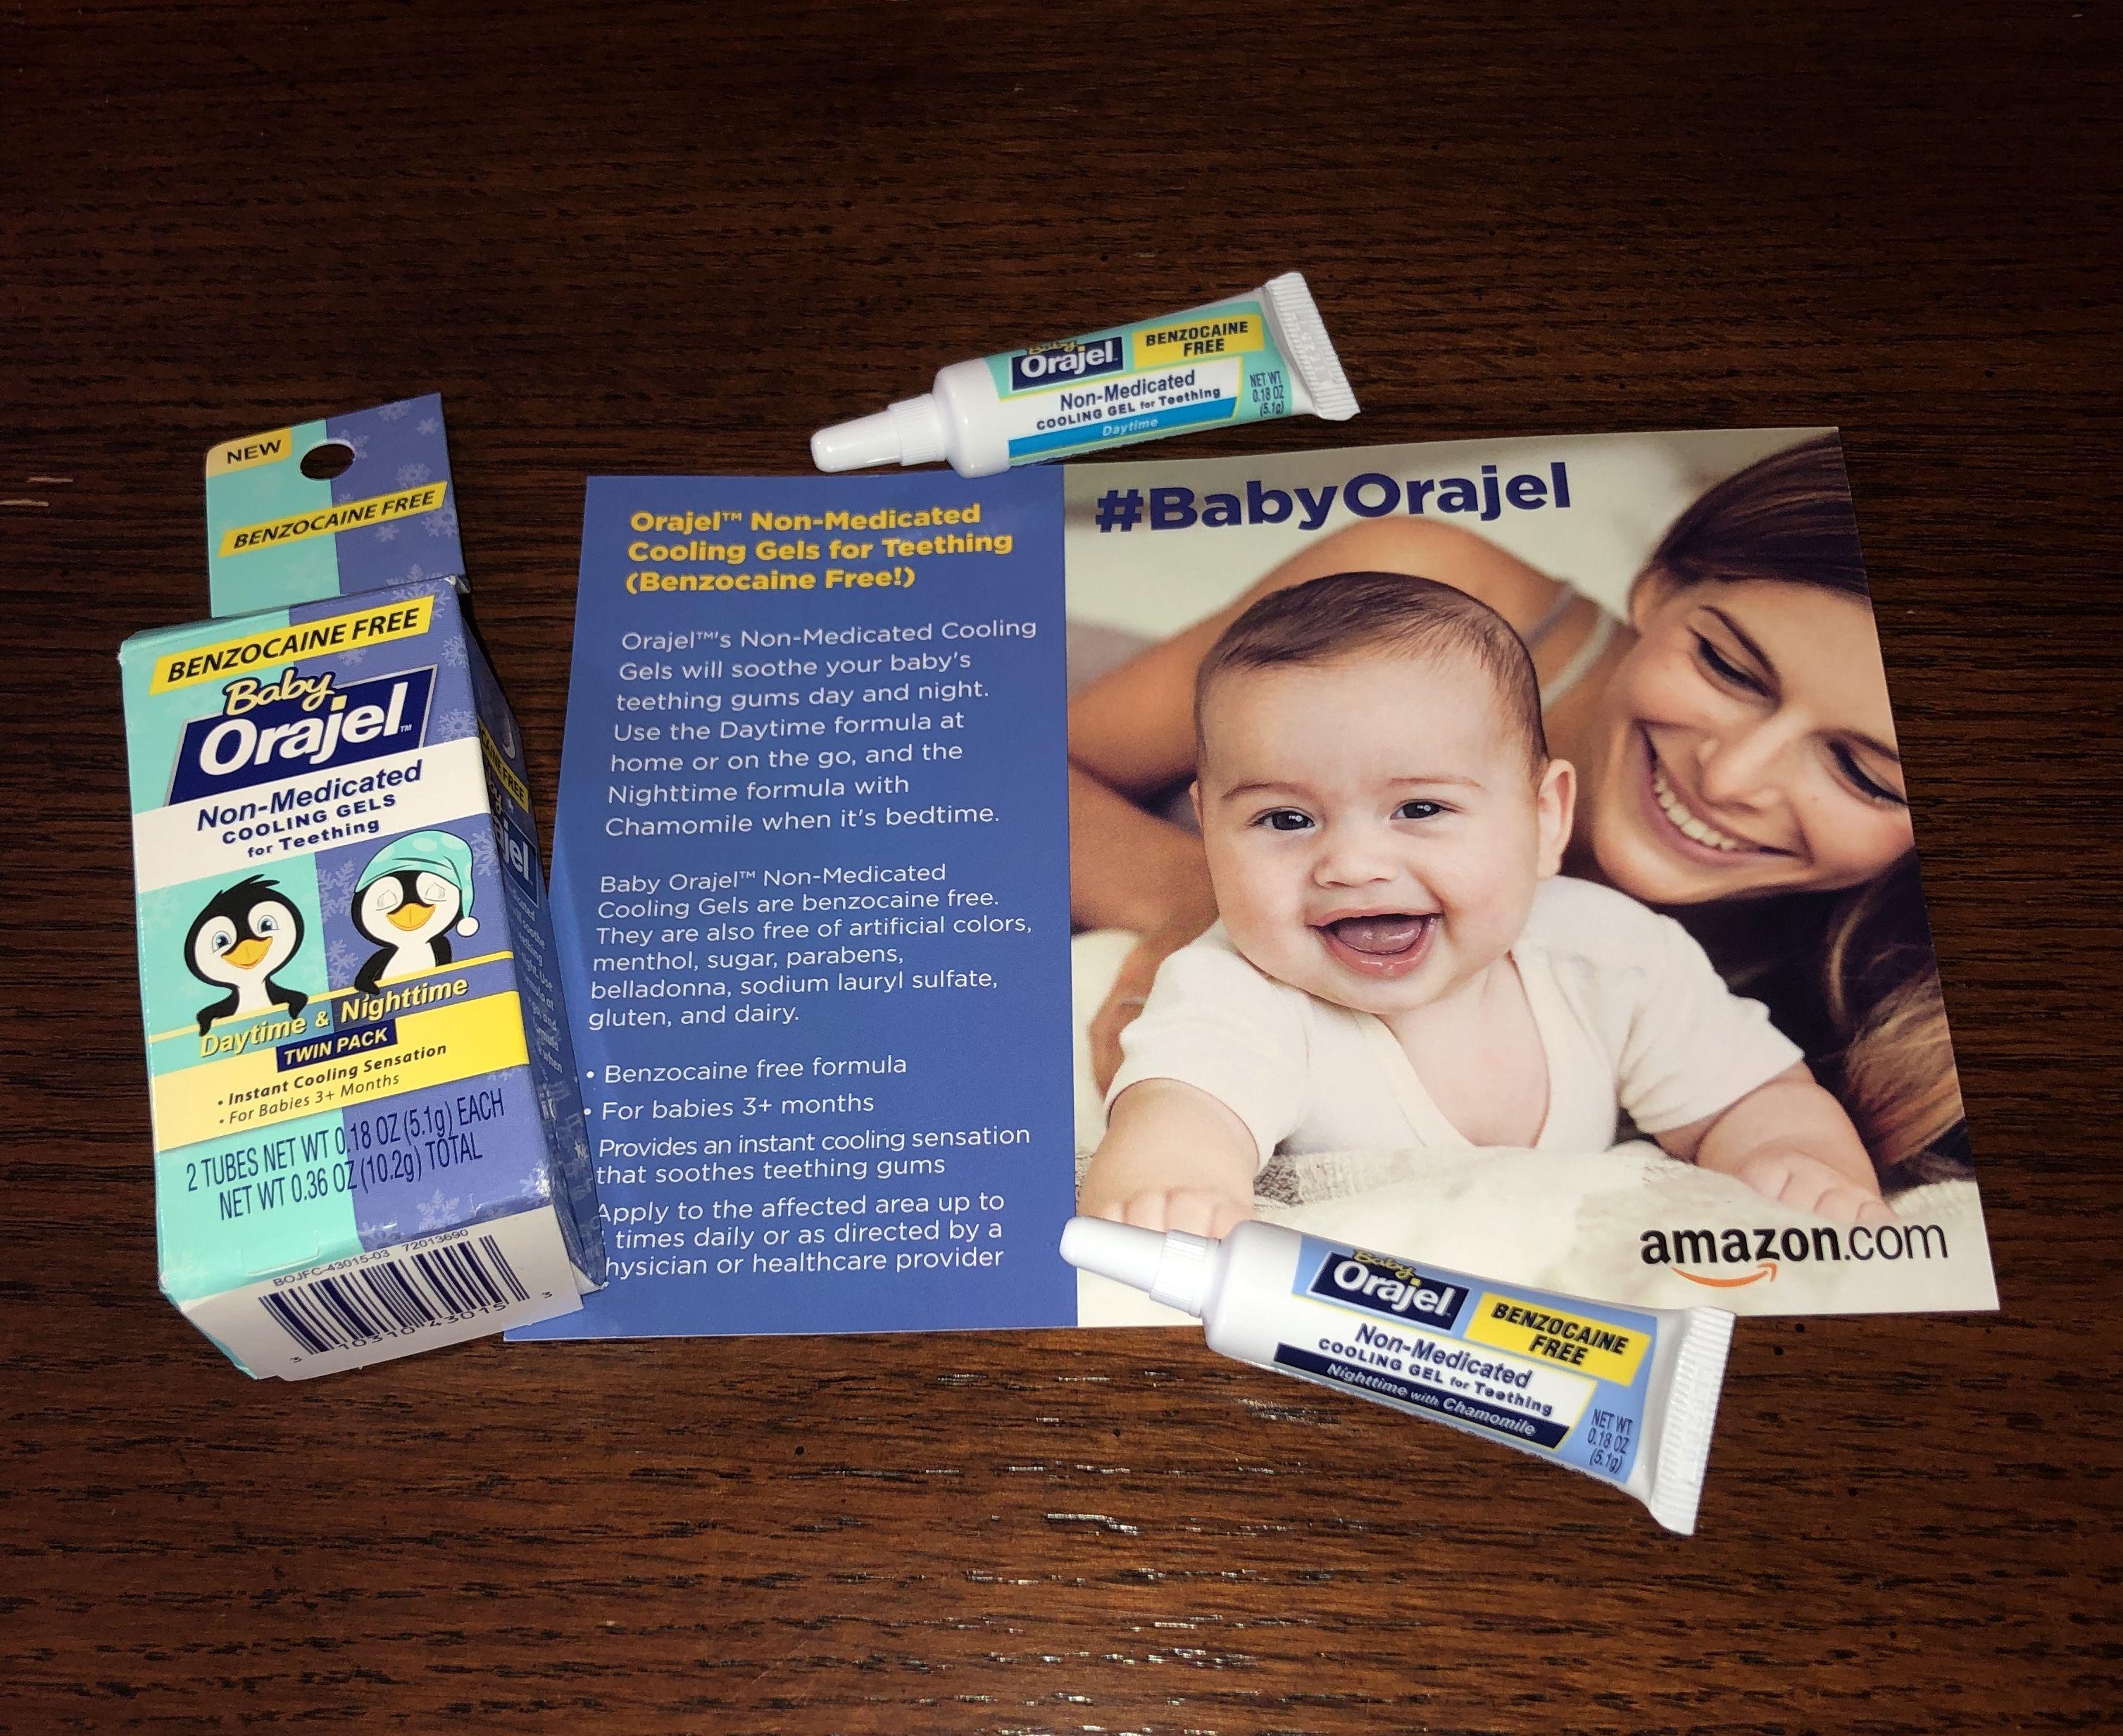 Baby Orajel Non Medicated Cooling Gels Teething Gums Baby Medical